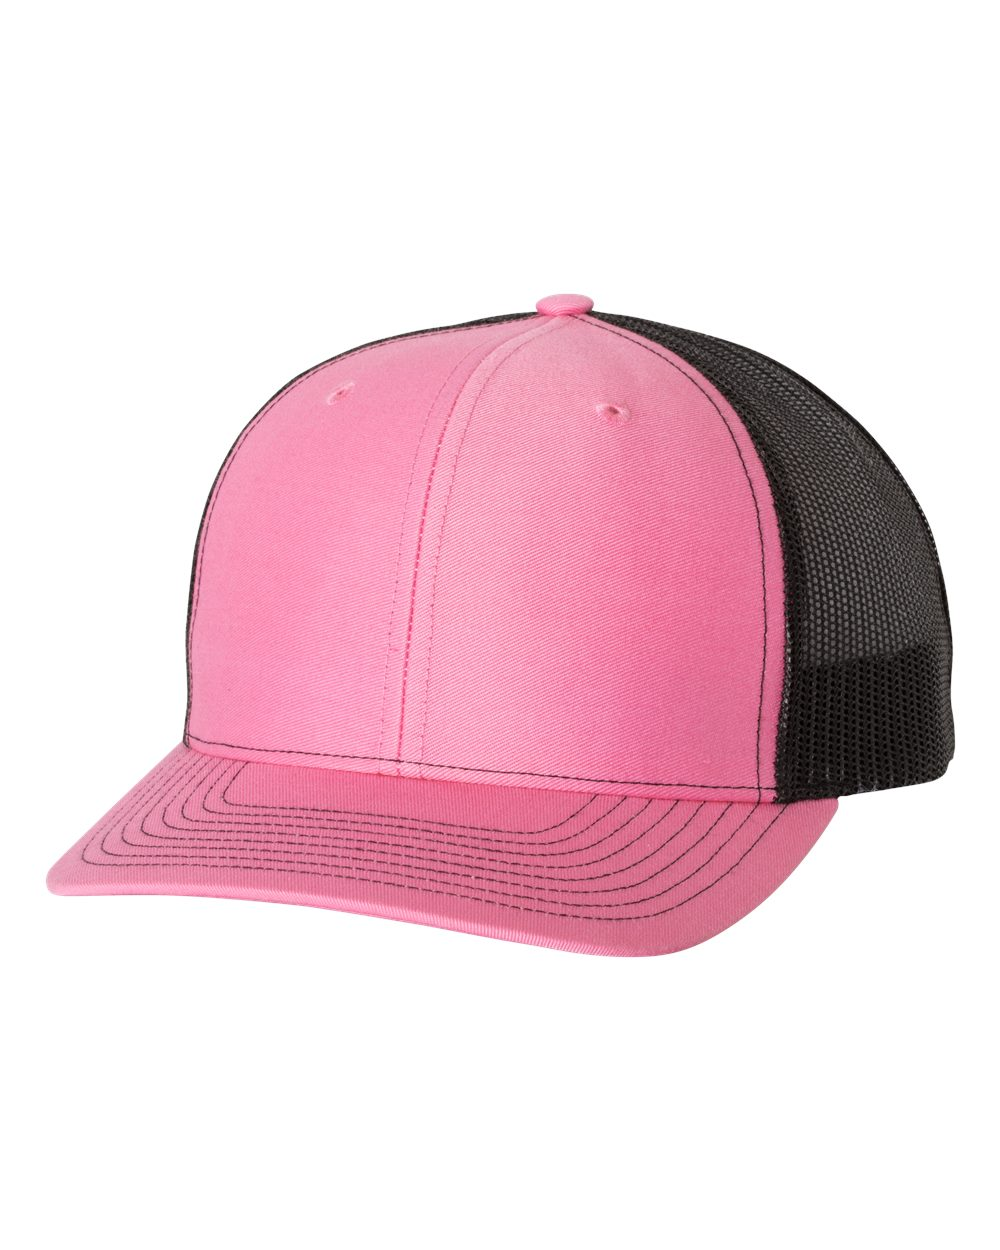 Hot Pink / Black